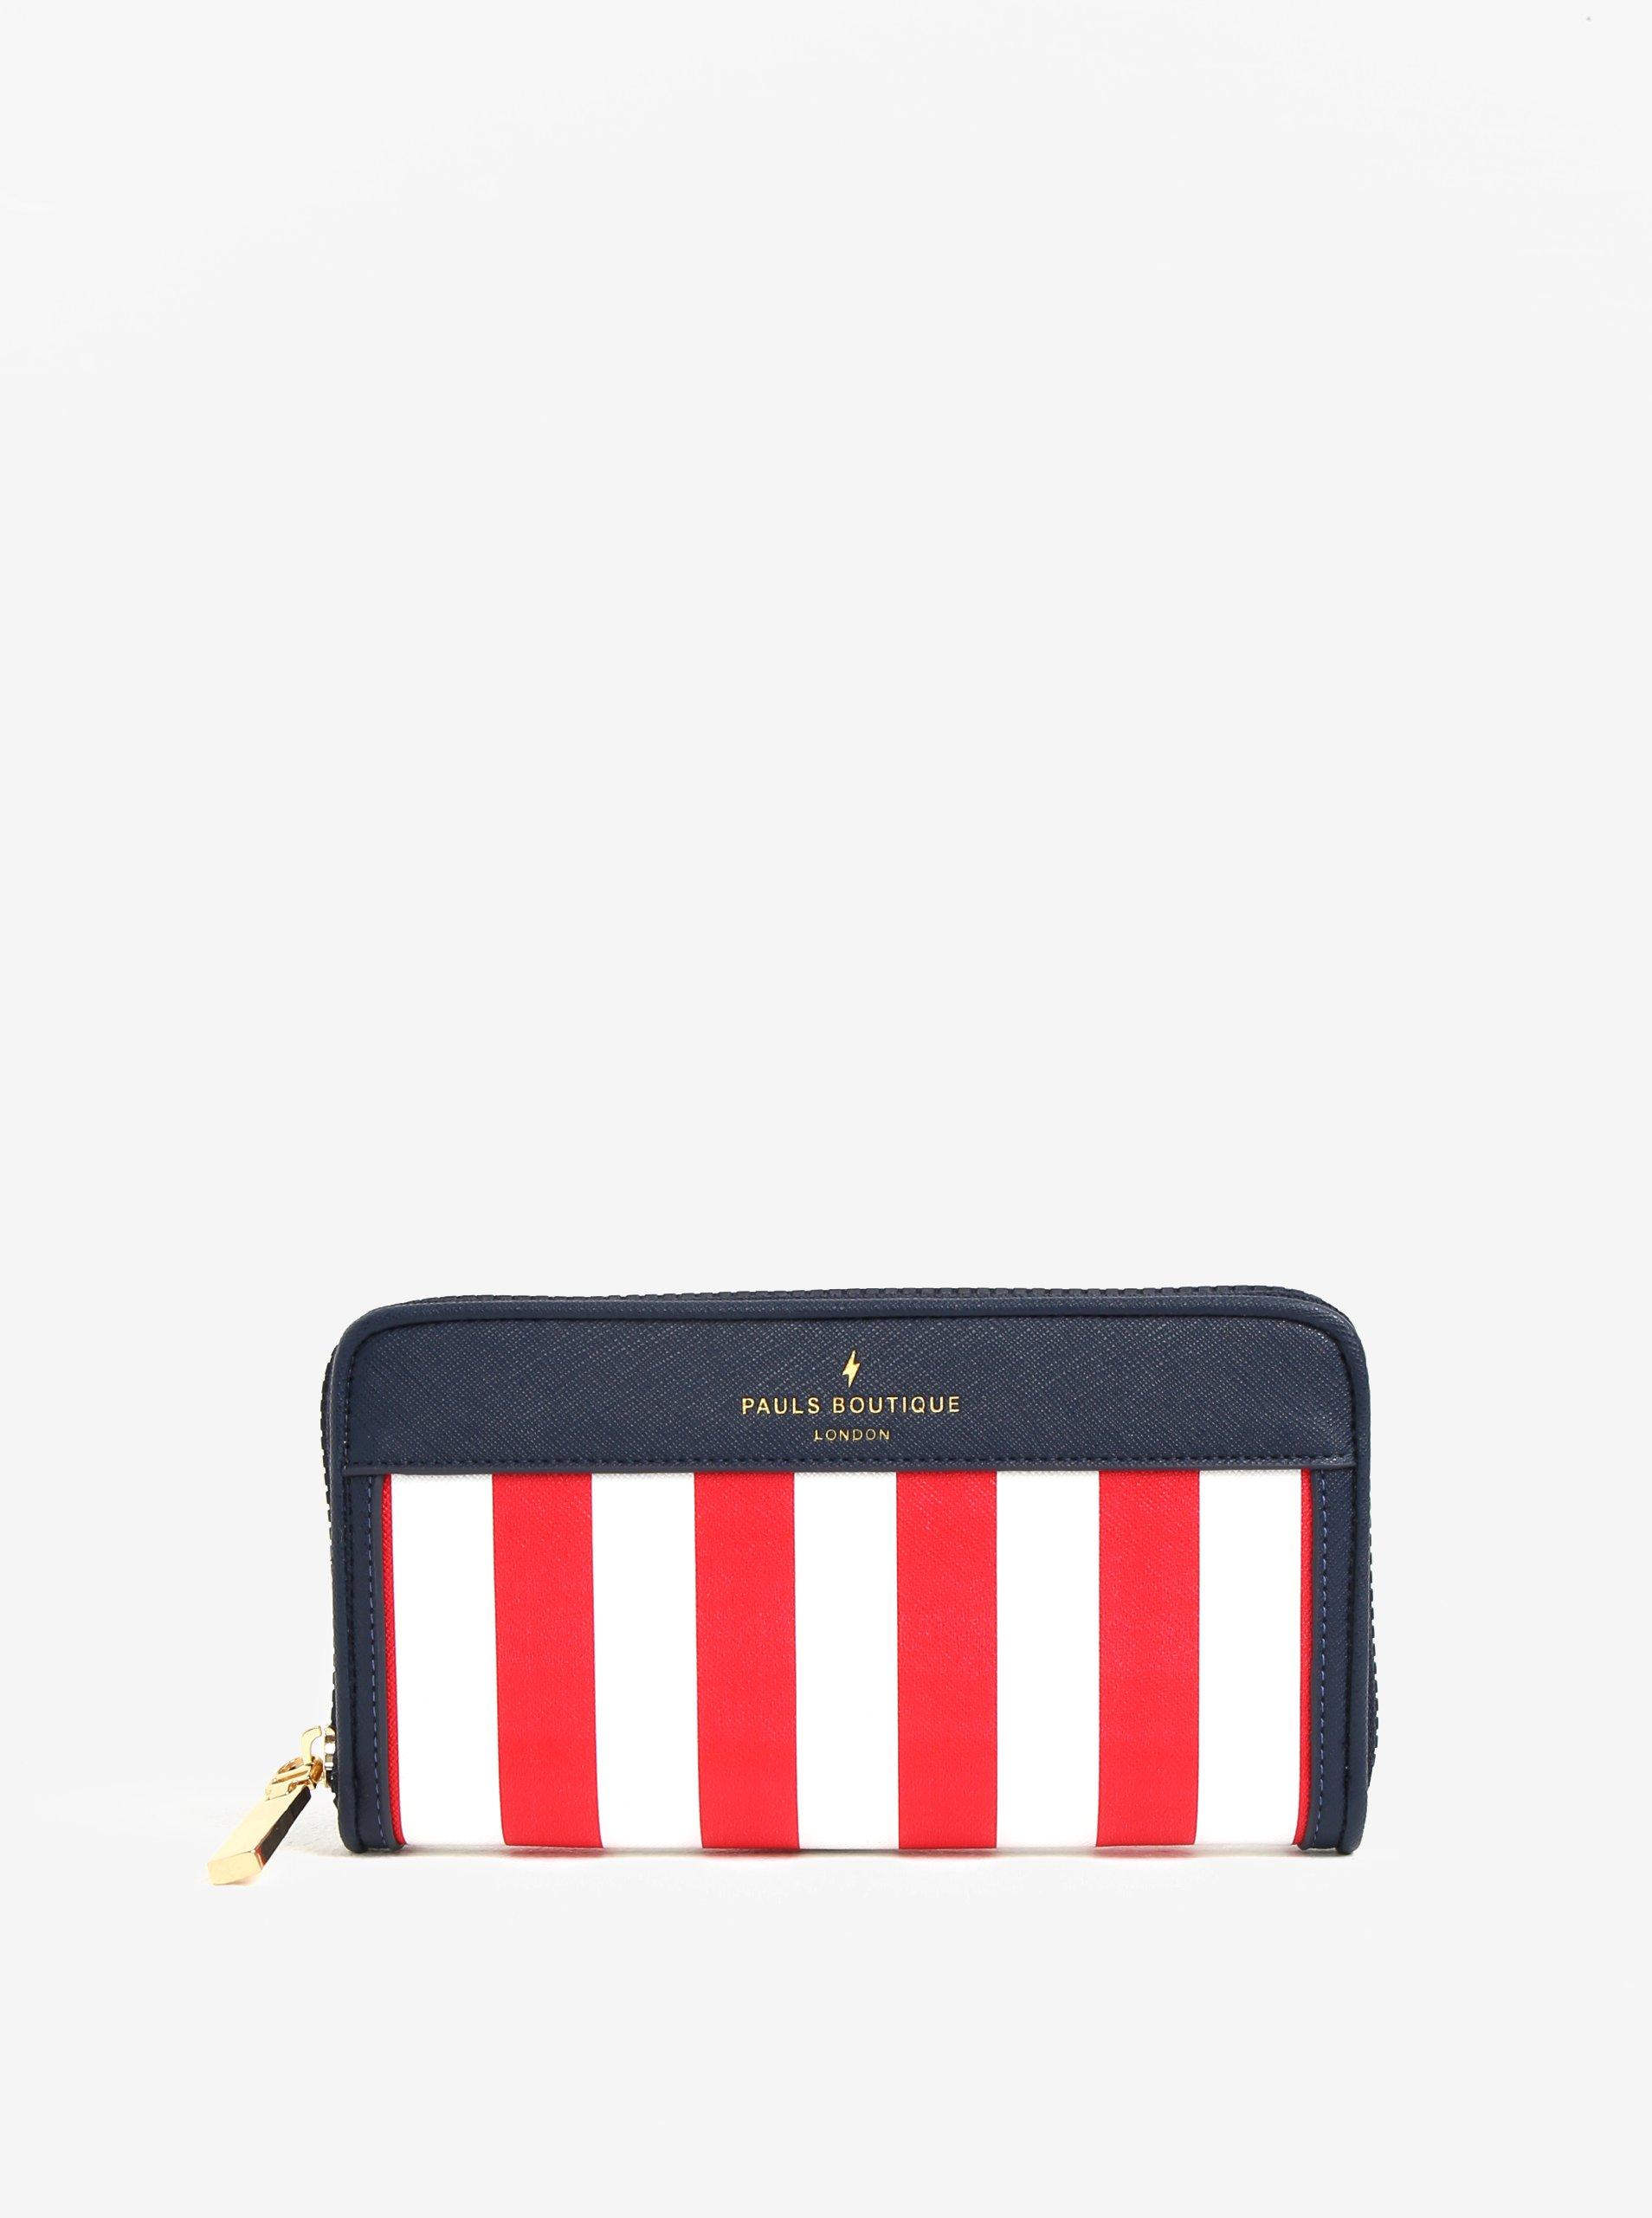 b5a4be5758 Bielo-červená pruhovaná peňaženka Paul s Boutique Lizzie